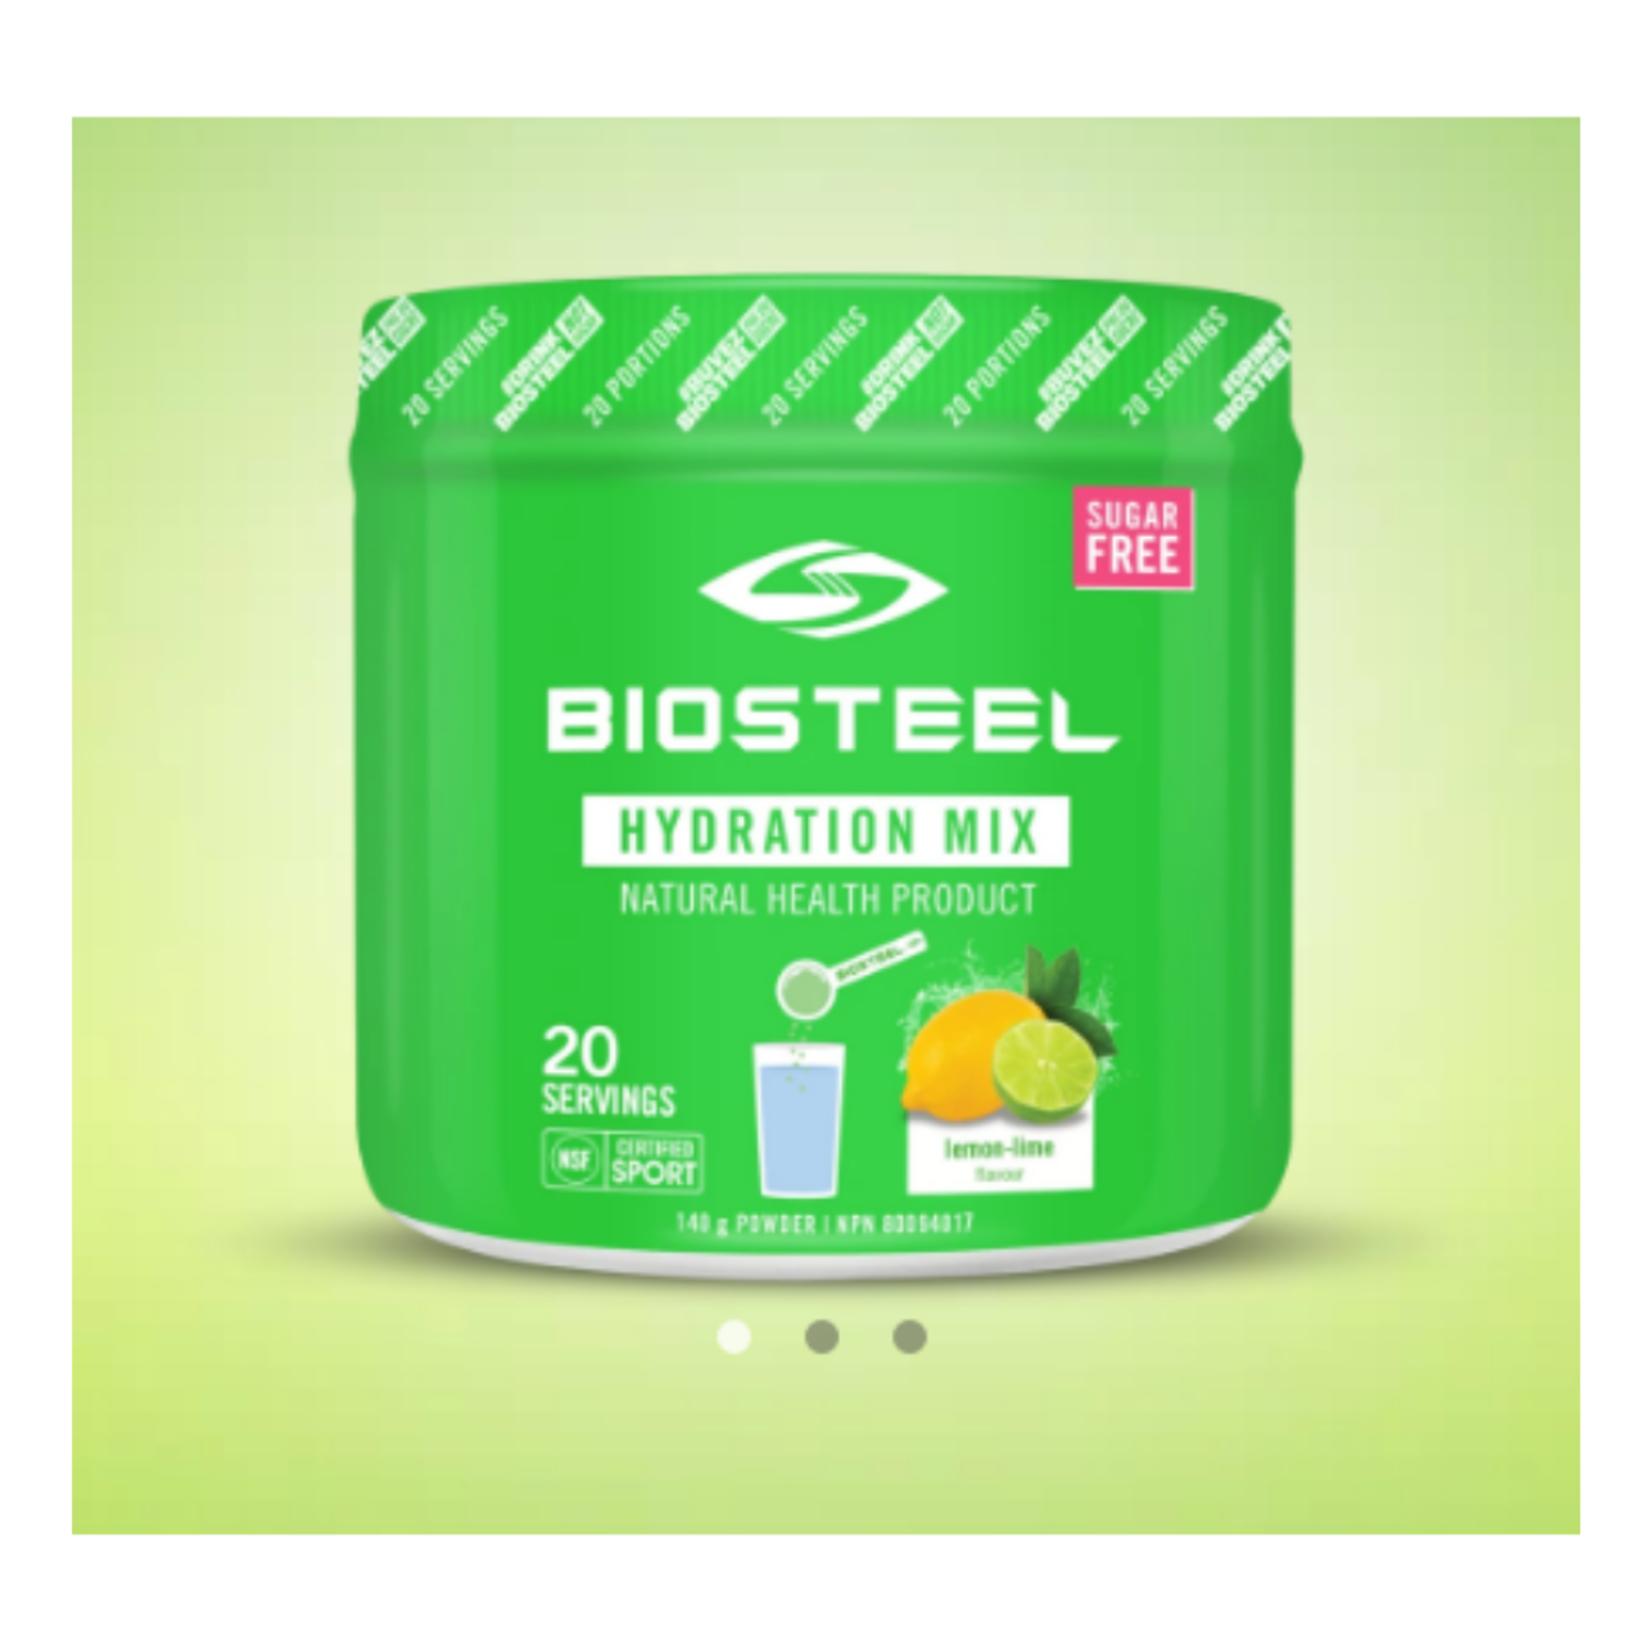 Biosteel Hydration Mix 140g - 20 Servings